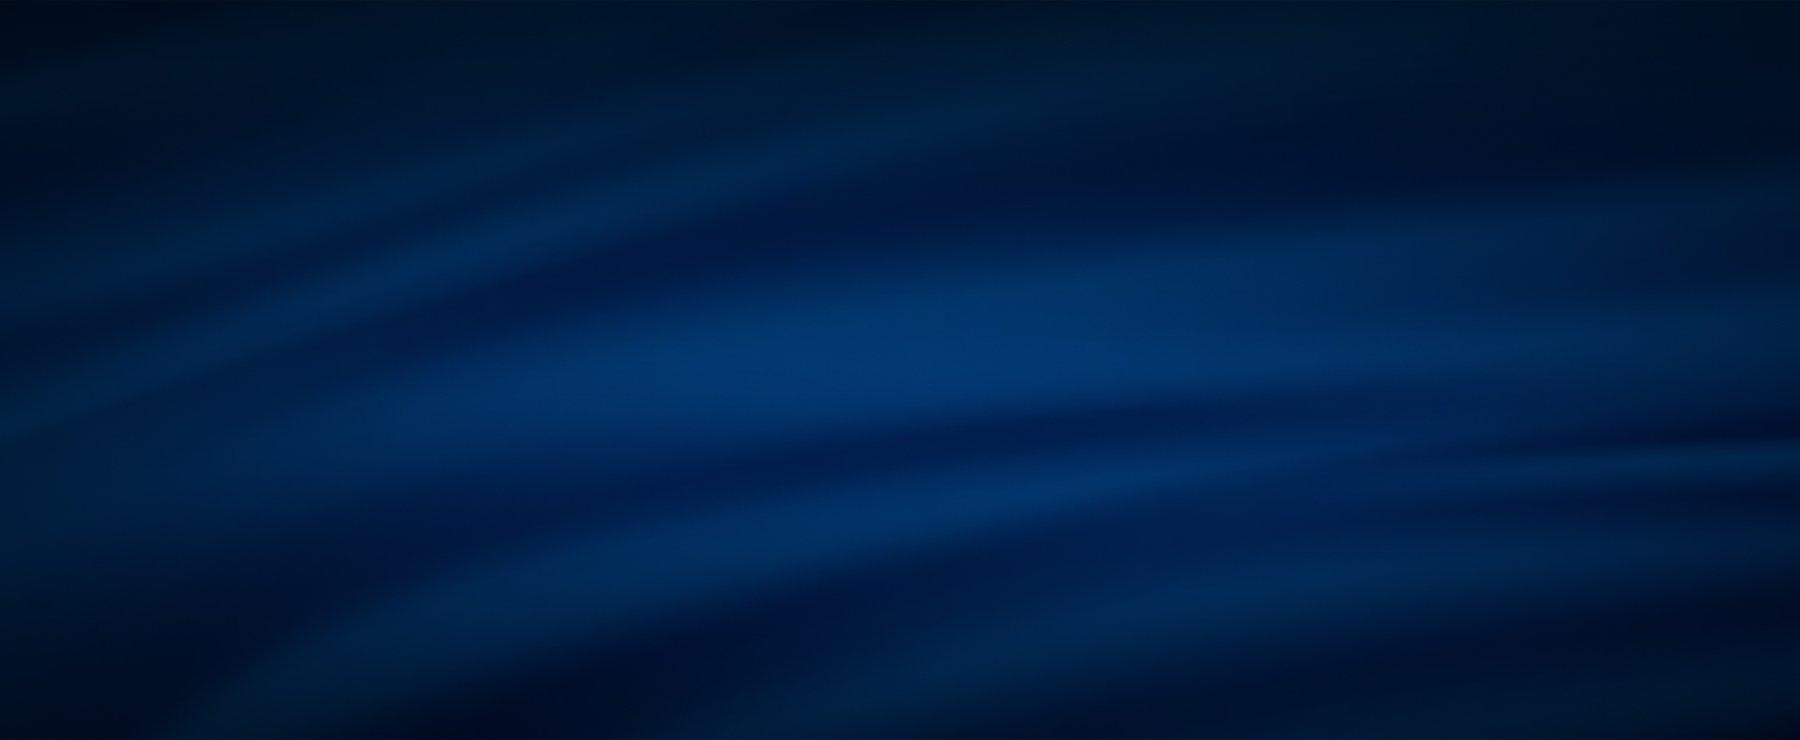 01_Homepage_Hero_Banner_Background2